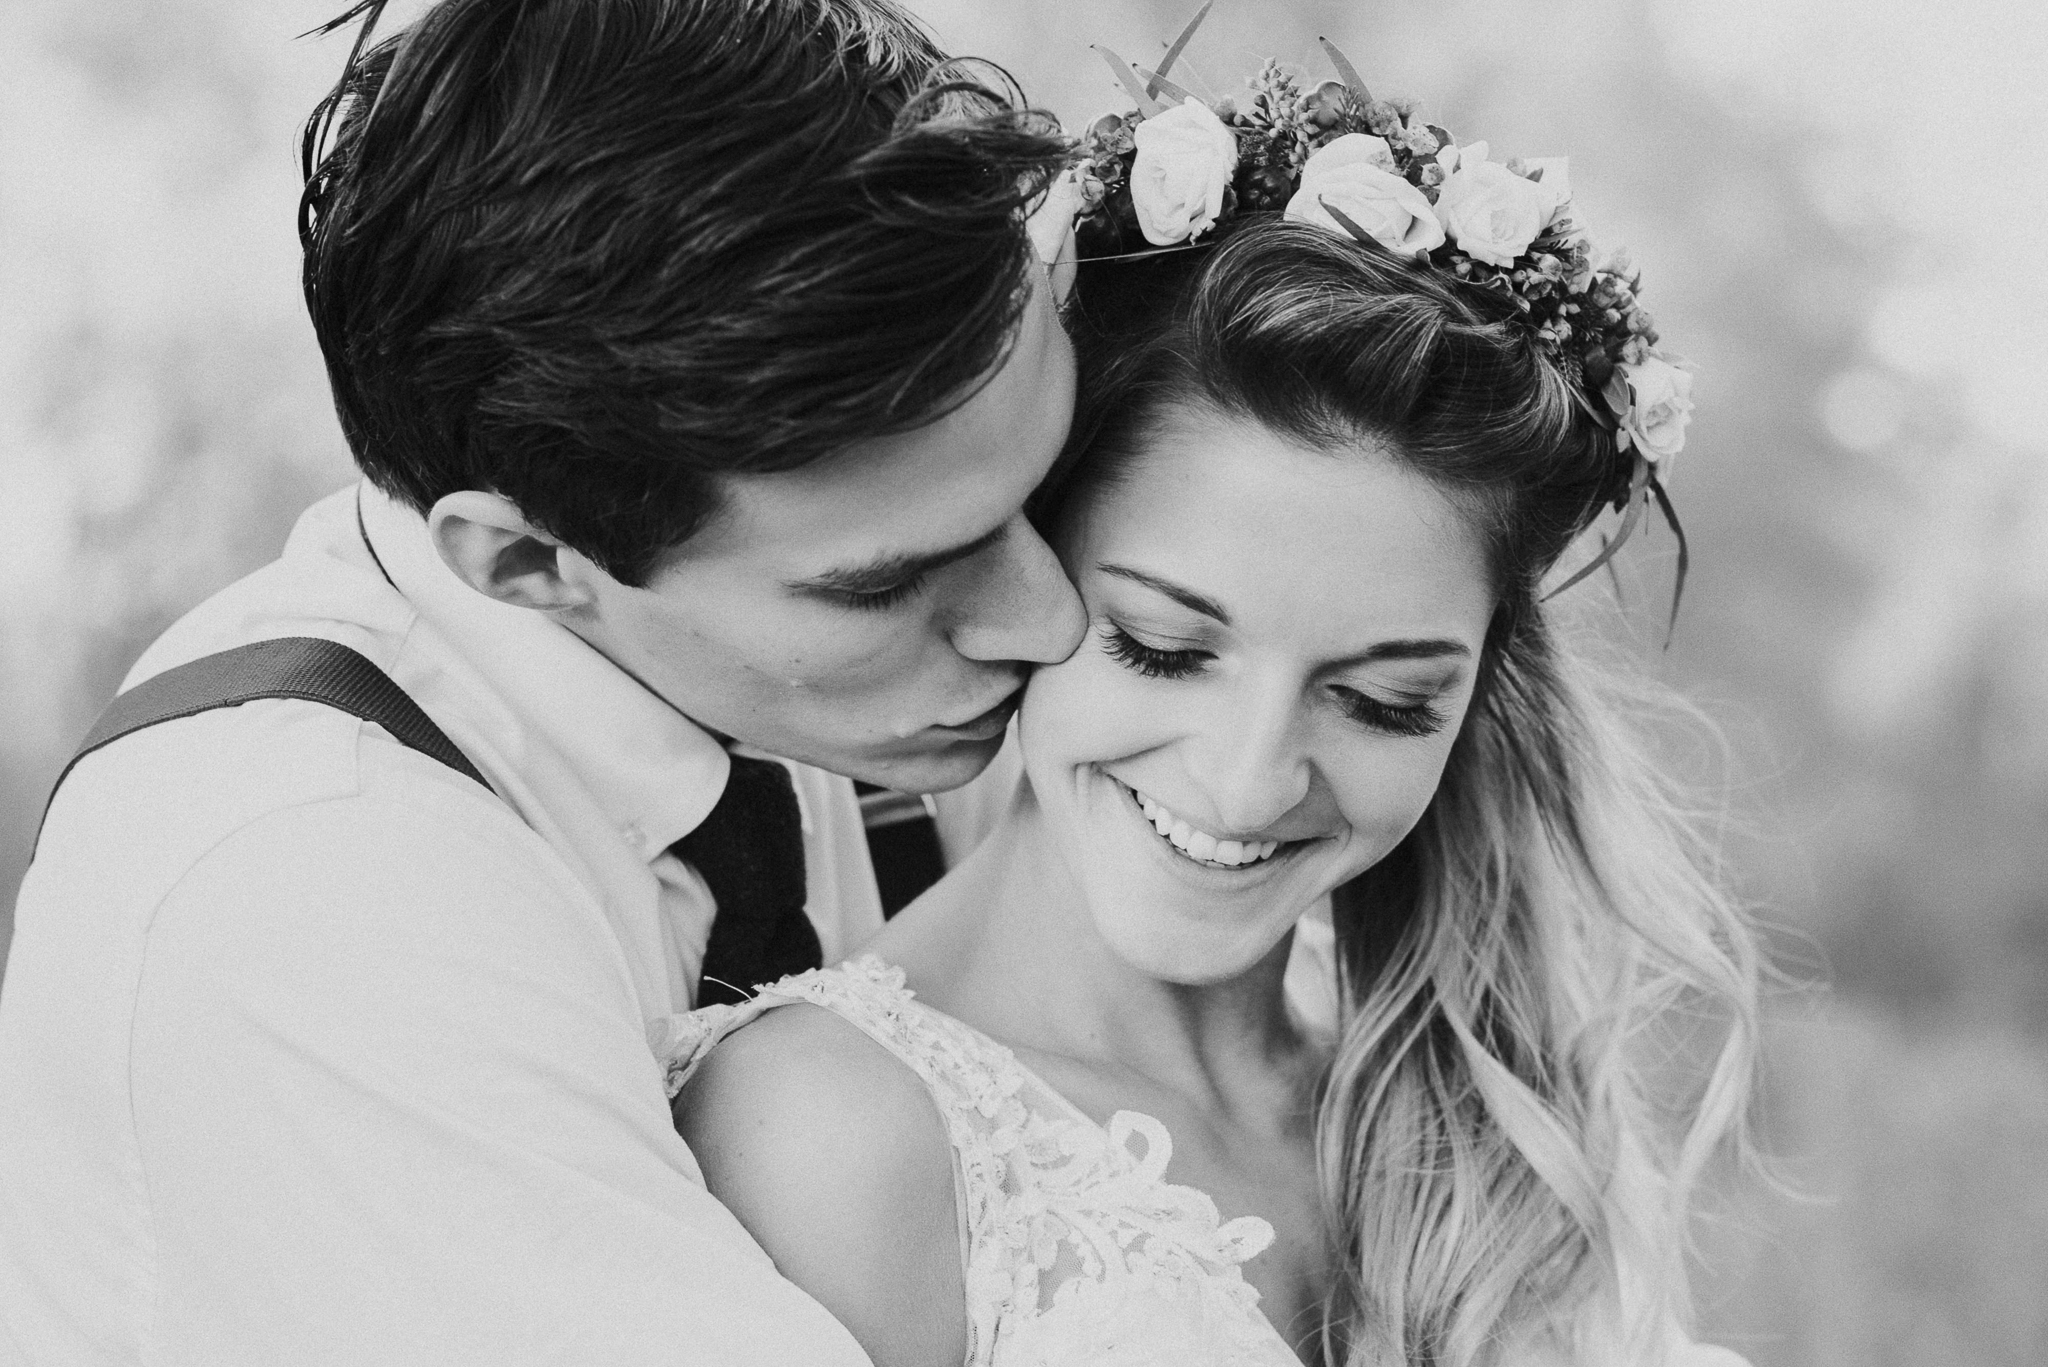 Michelle + Aron-Houston Wedding Photographer-Magnolia Meadows-Winter Wedding | Kristen Giles Photography - 062.jpg